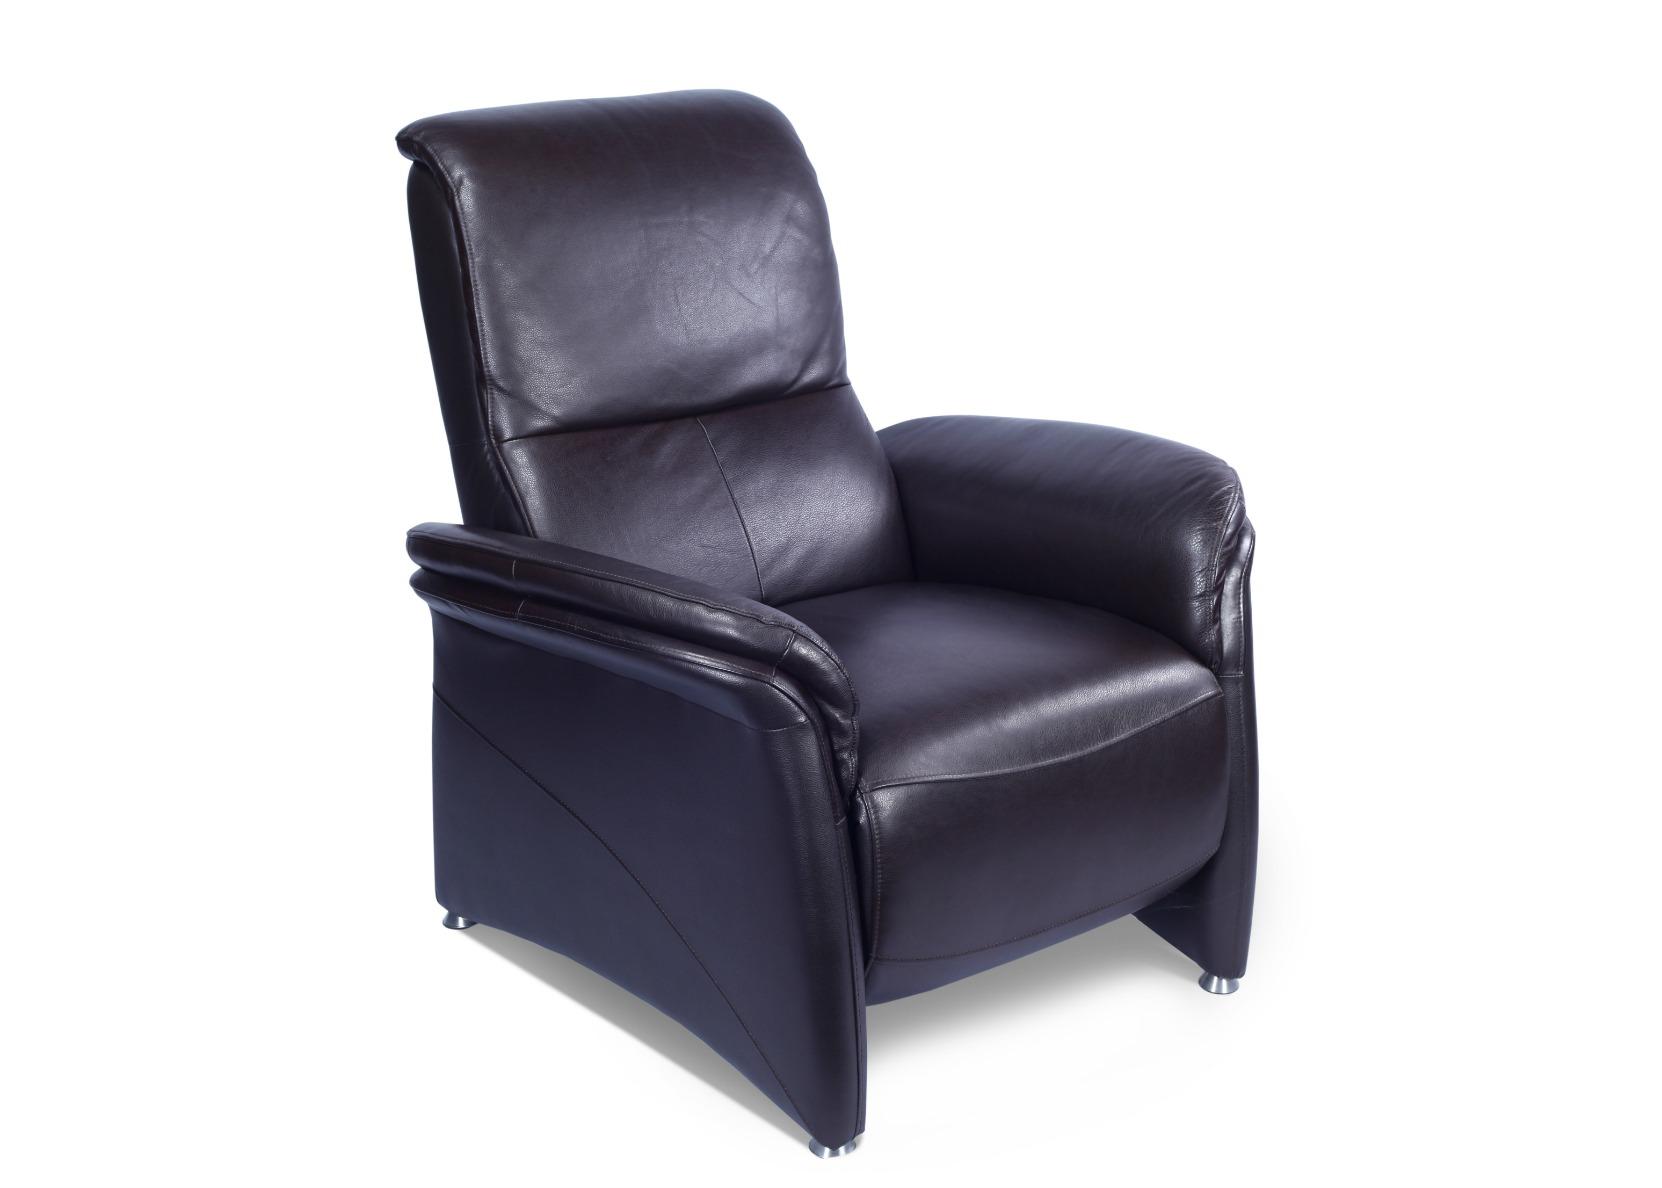 dark brown leather recliner chair. manual reclining chair in dark brown leather recliner l